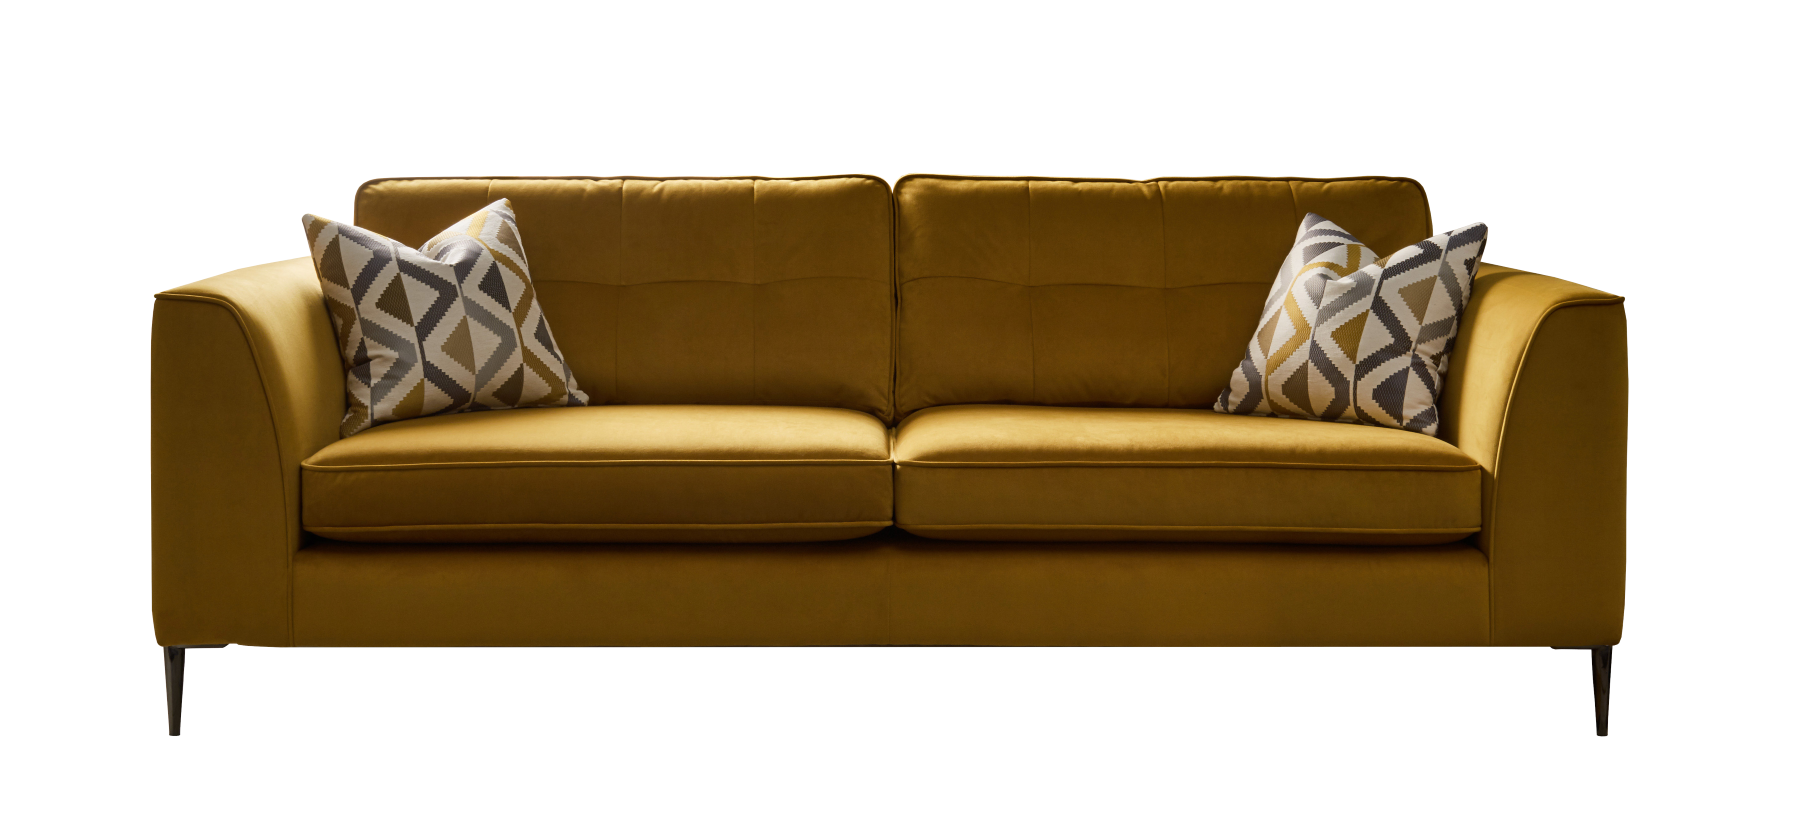 Daytona 4 Seater Sofa